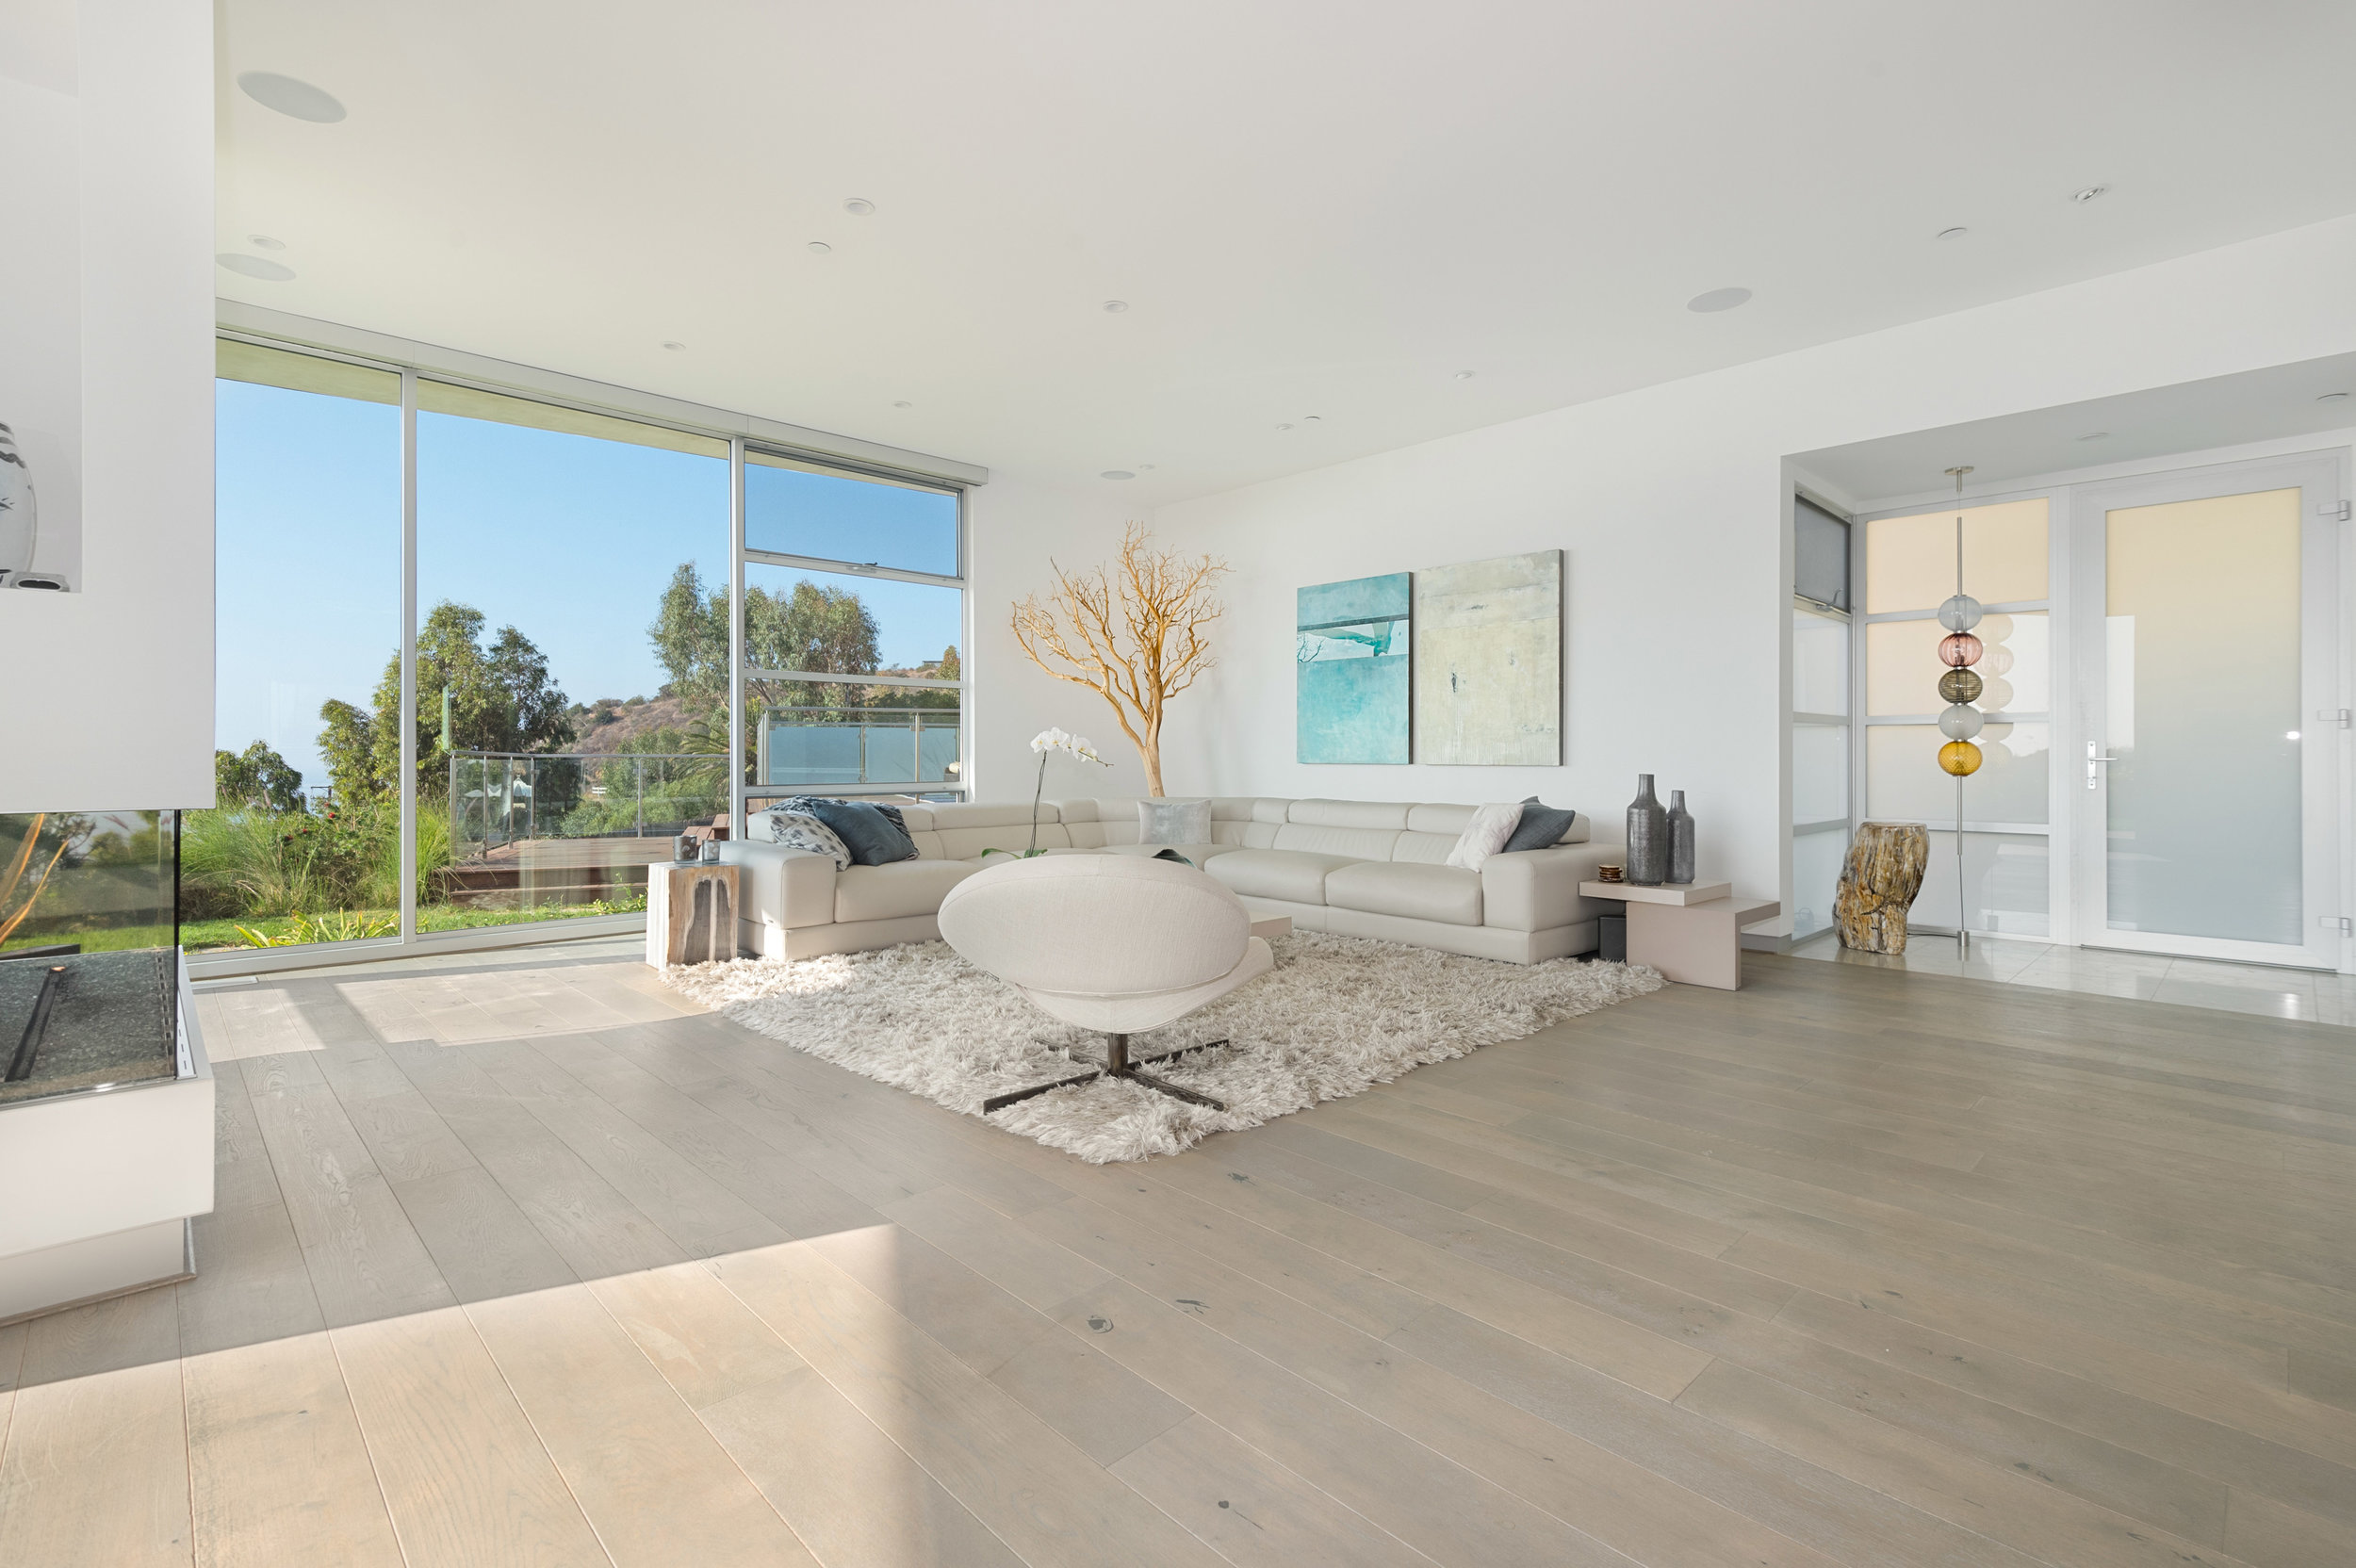 Copy of 009.1 Living Room 20729 Eaglepass For Sale Lease The Malibu Life Team Luxury Real Estate.jpg